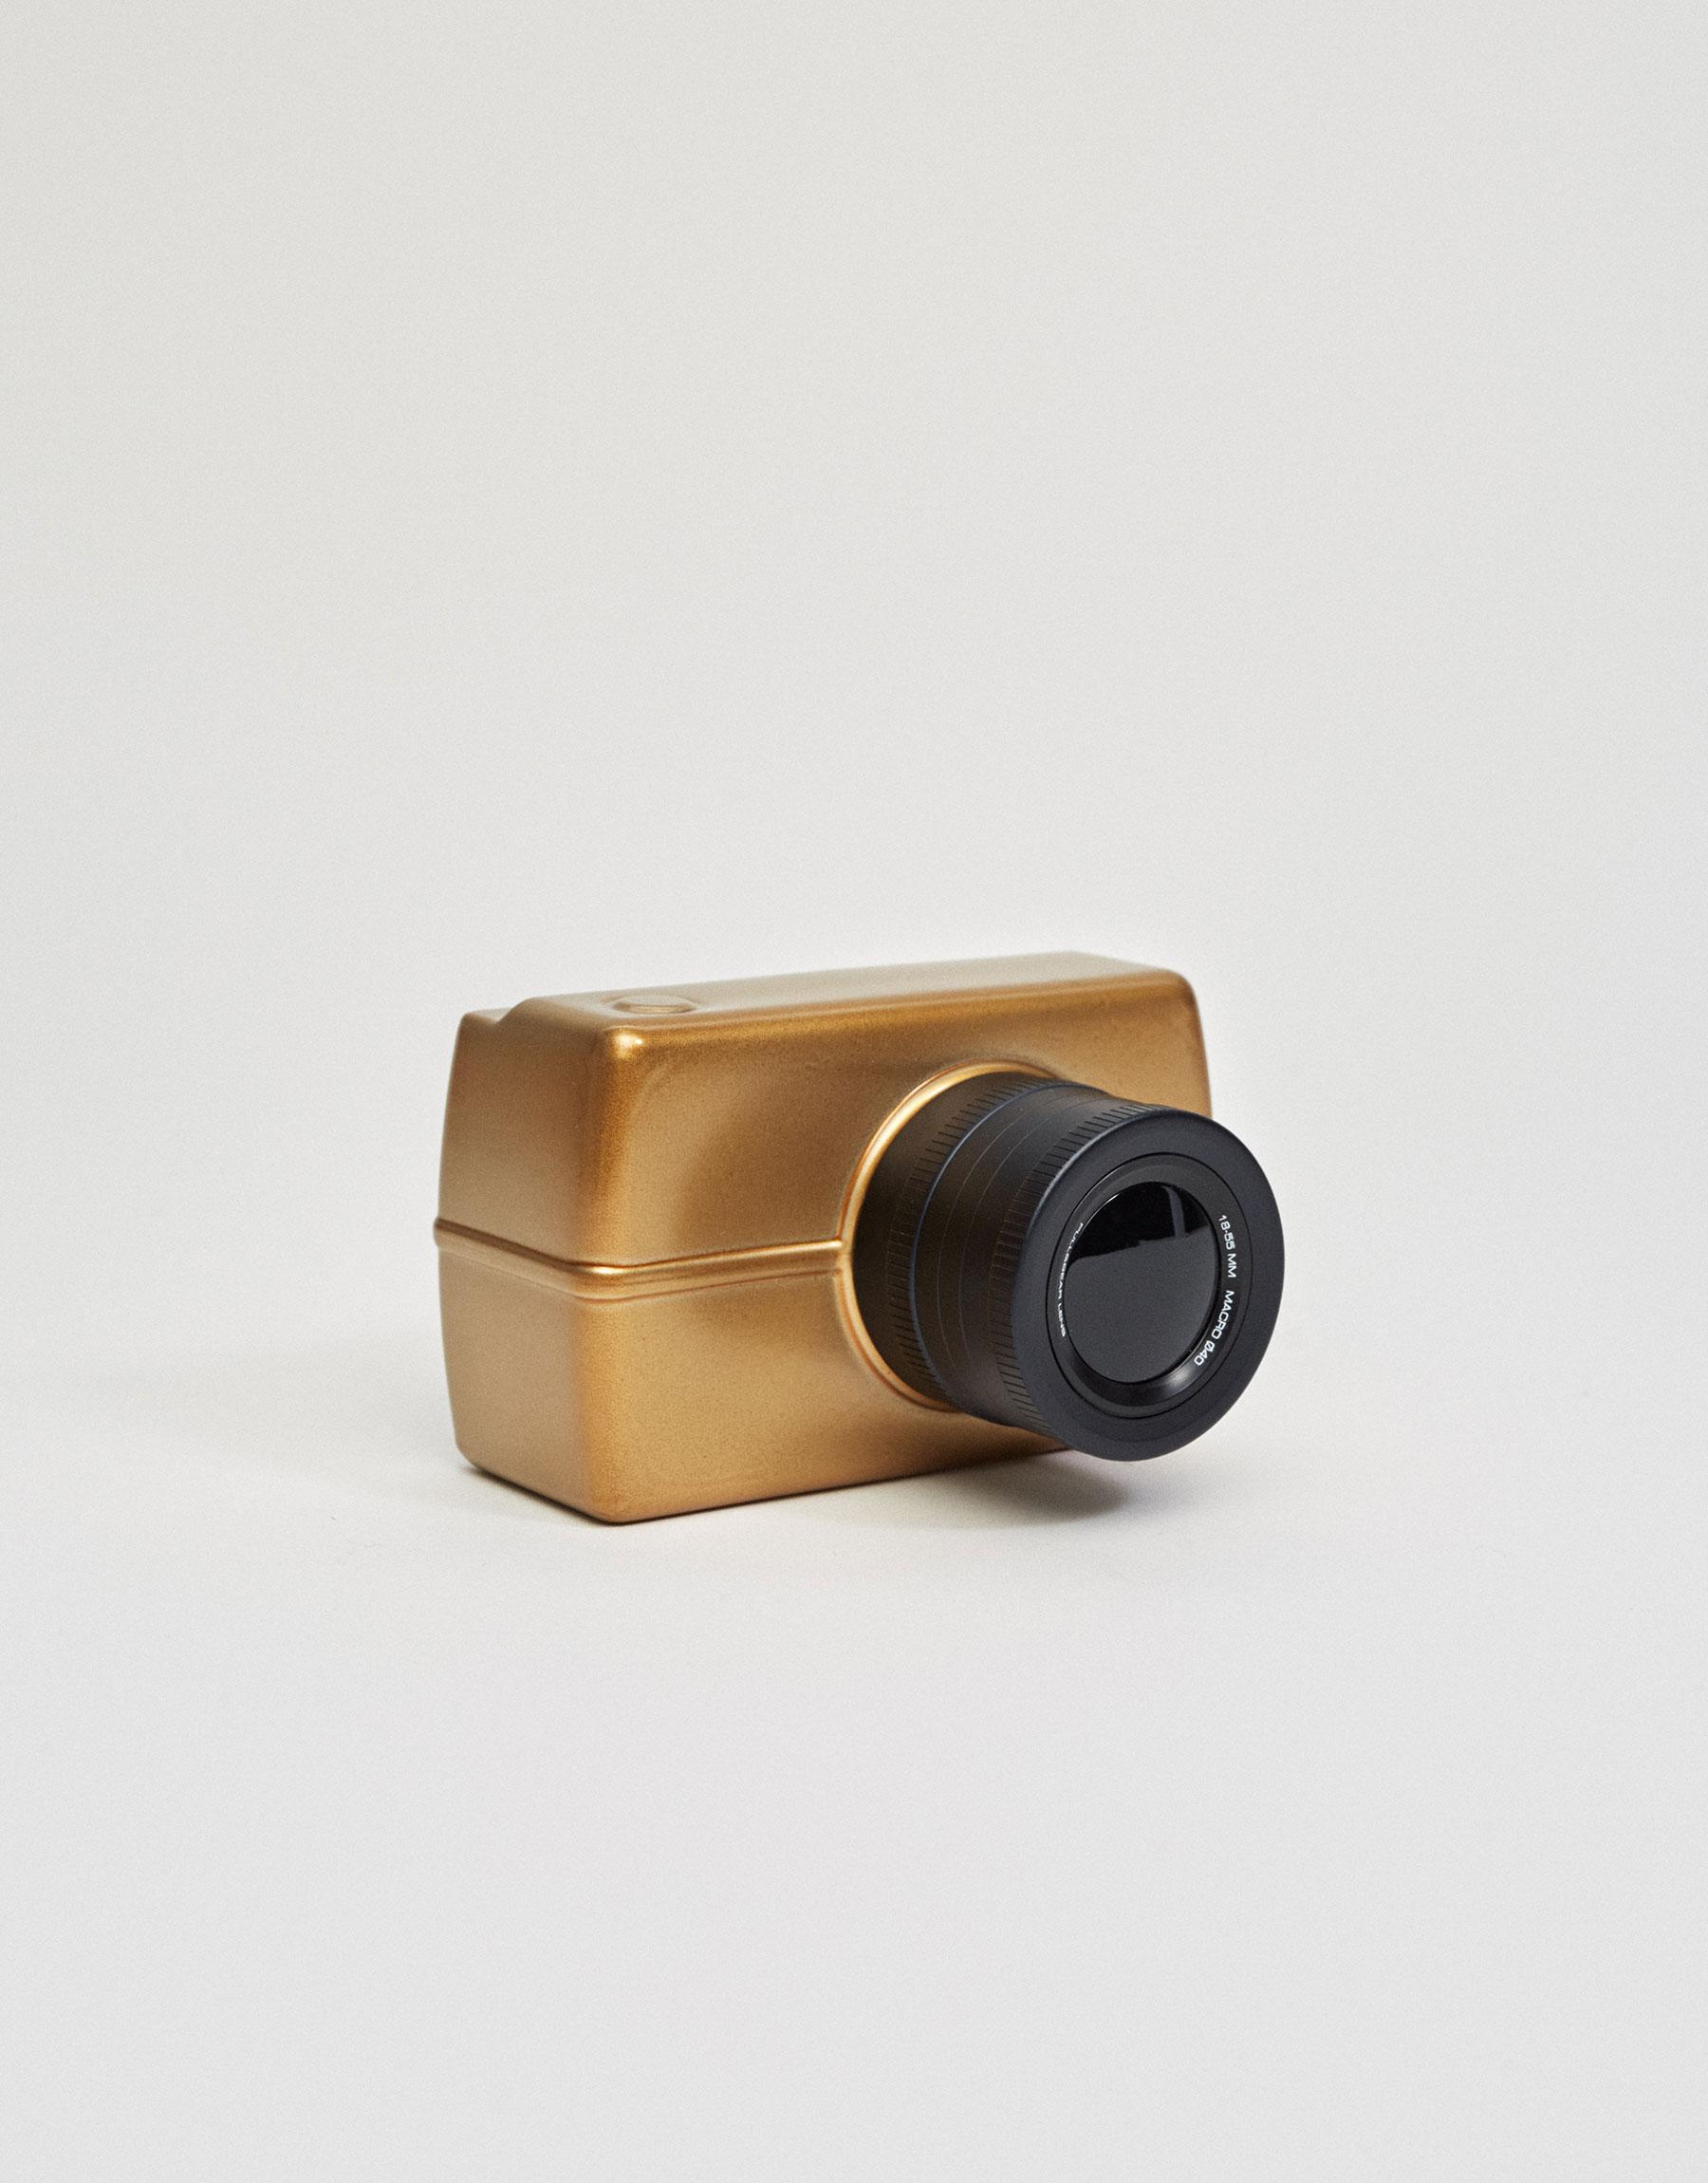 Pull & bear shot gold eau de cologne